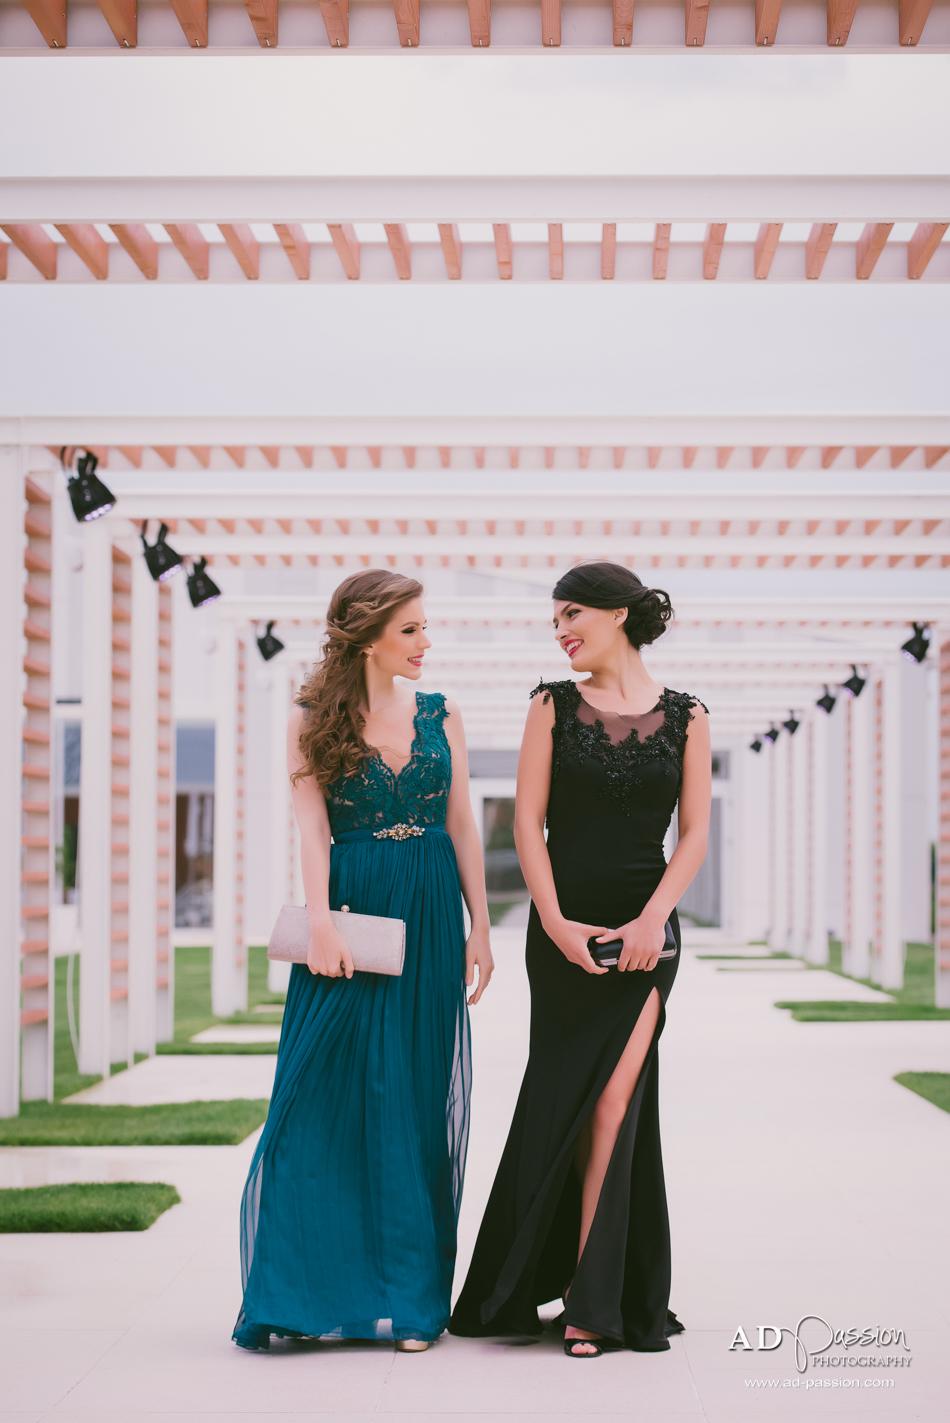 AD Passion Photography   20150625_claudia-irene-fotograf-absolventi-sedinta-foto-banchet_0034   Adelin, Dida, fotograf profesionist, fotograf de nunta, fotografie de nunta, fotograf Timisoara, fotograf Craiova, fotograf Bucuresti, fotograf Arad, nunta Timisoara, nunta Arad, nunta Bucuresti, nunta Craiova